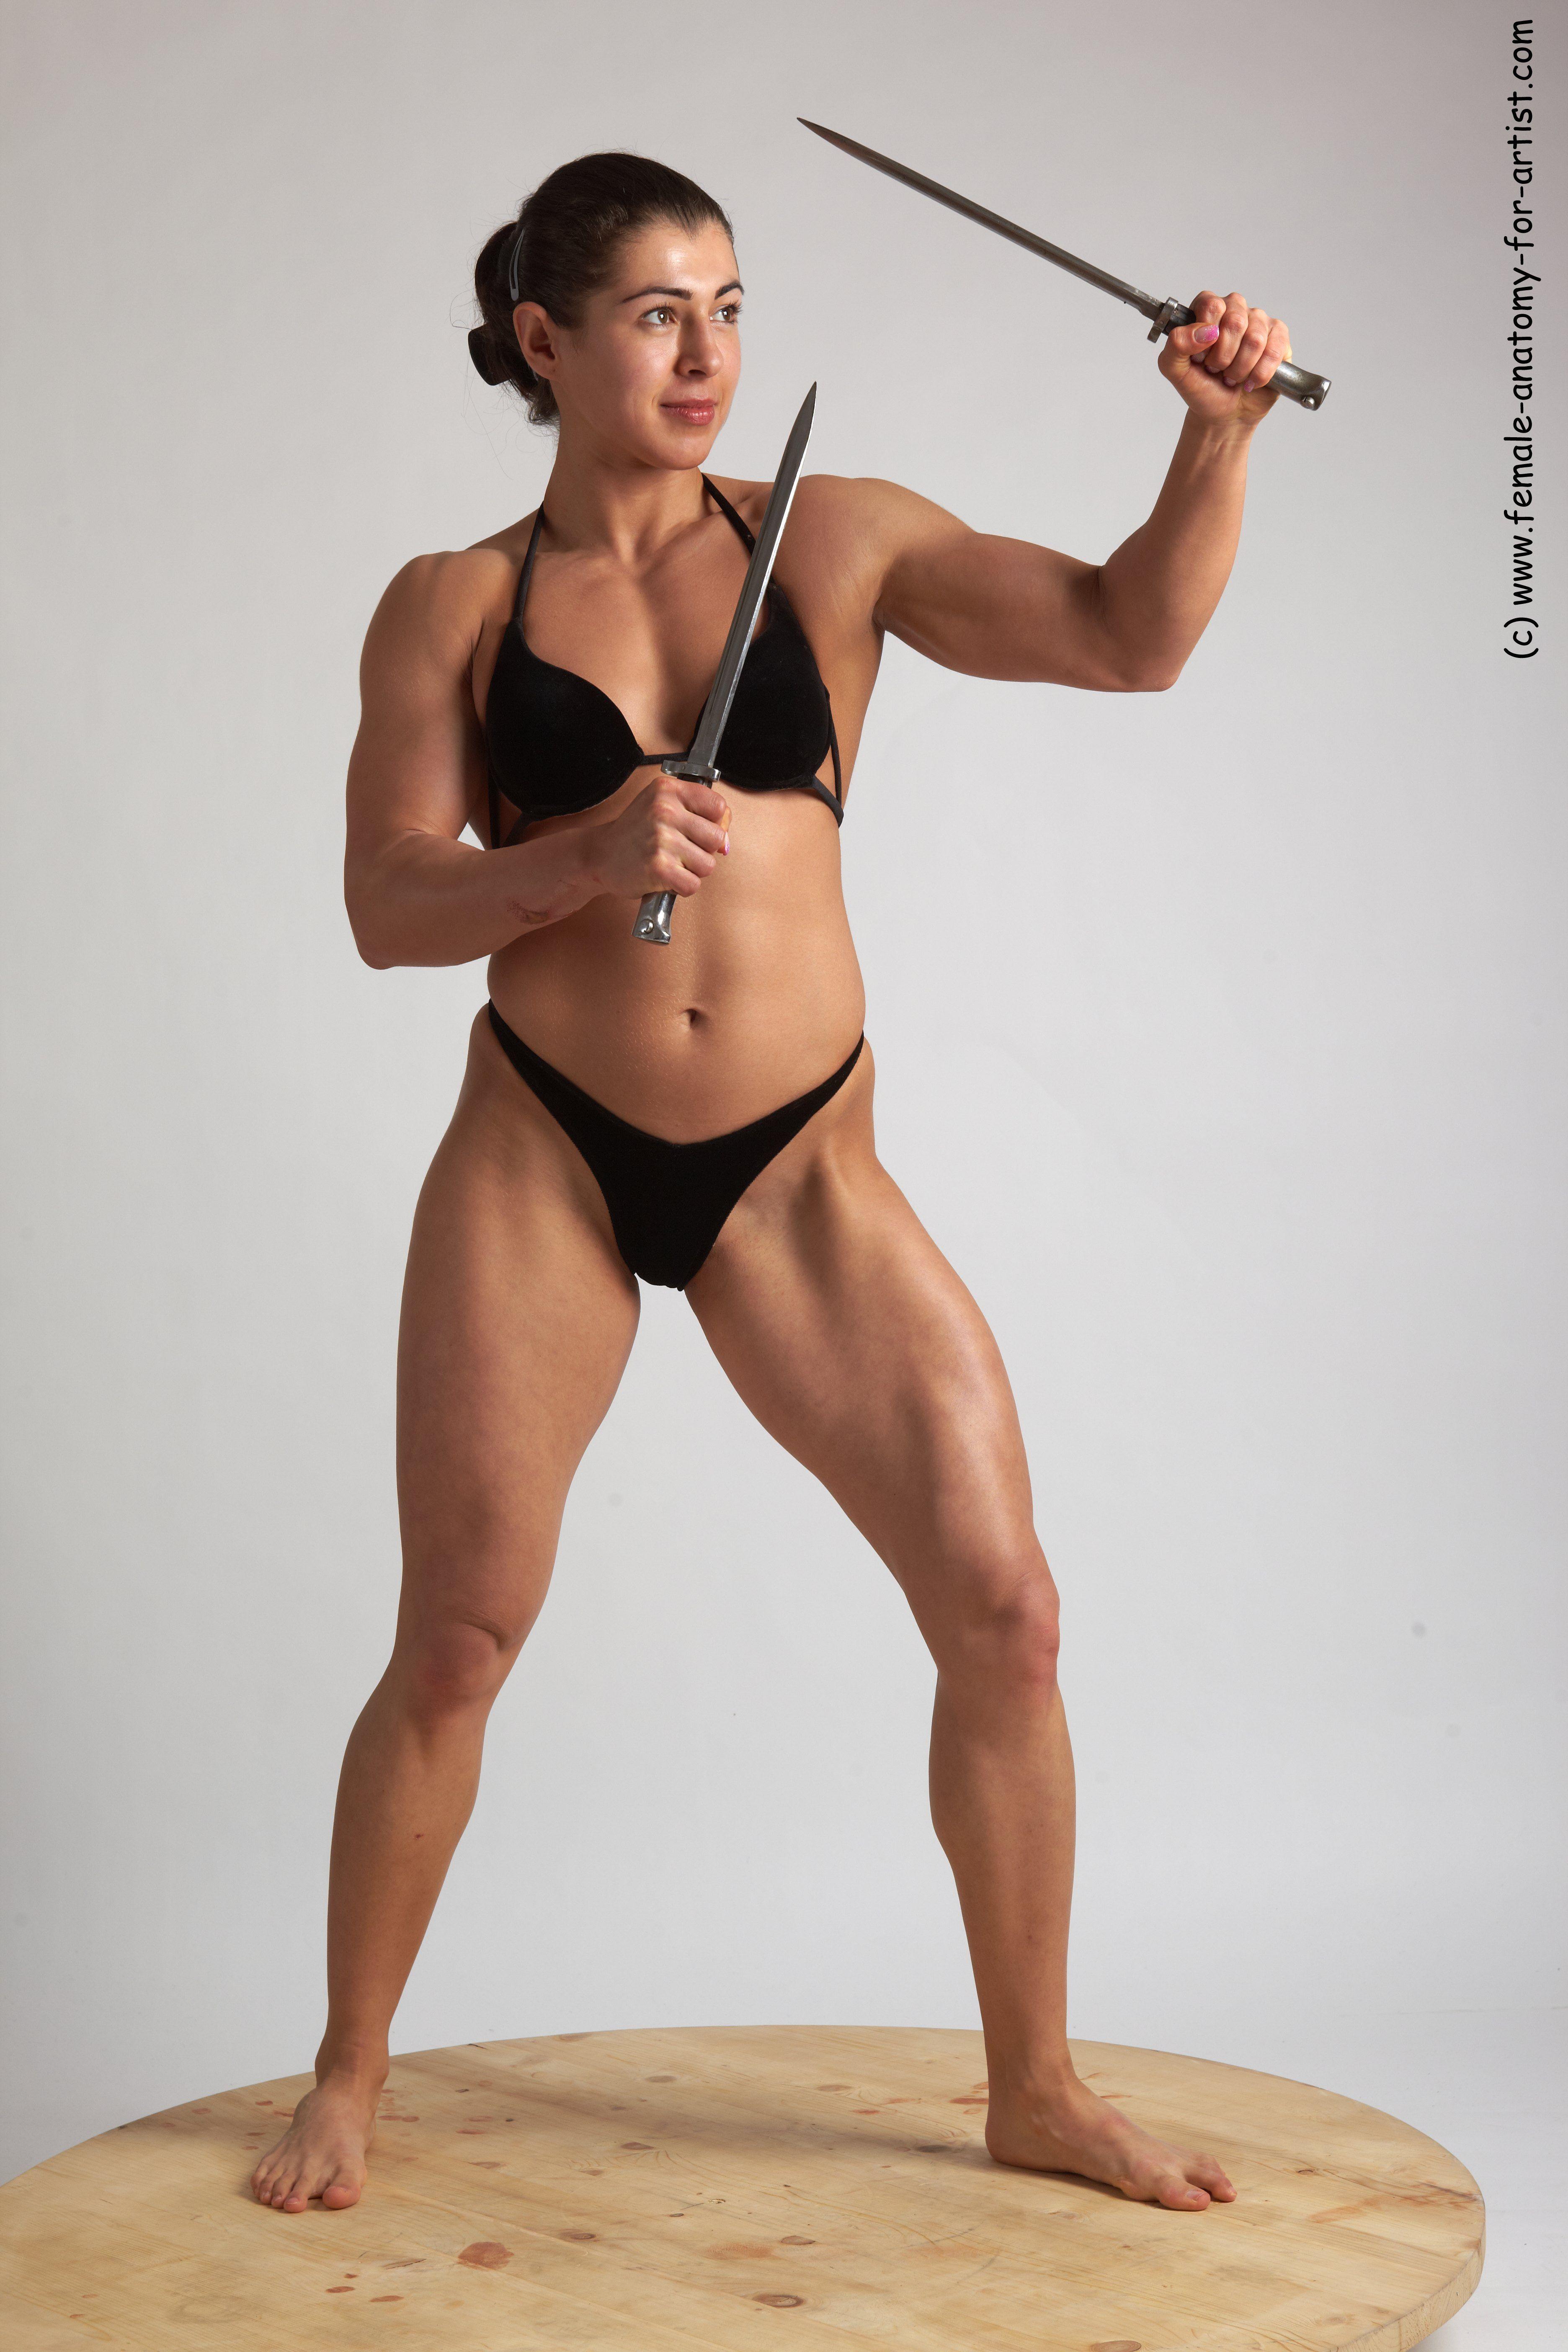 Porno fitness girl photo